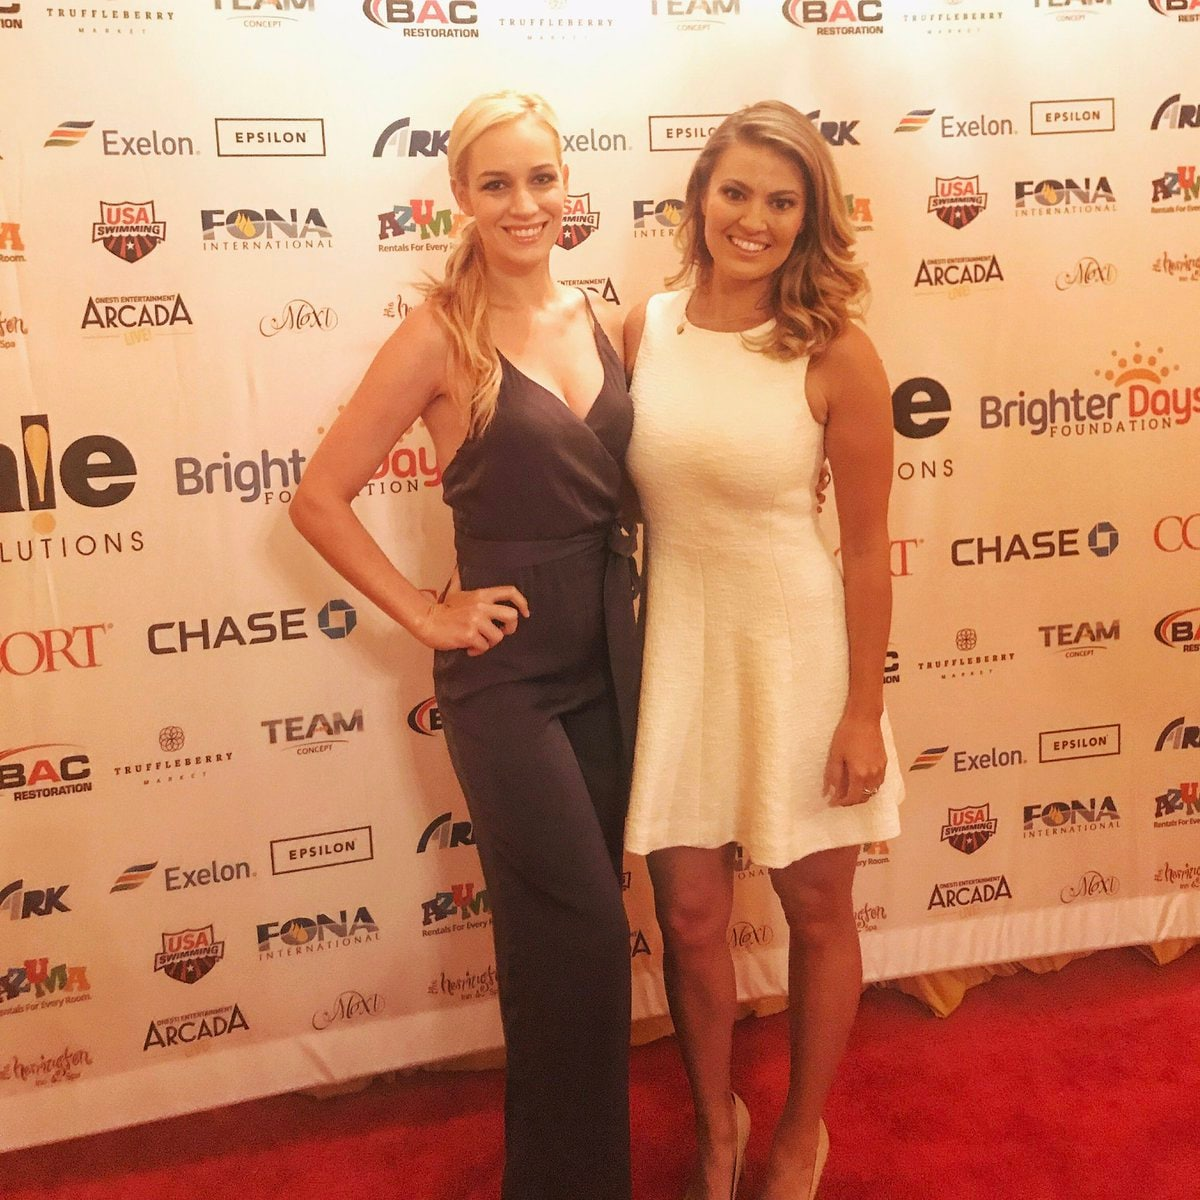 Paige Spiranac and Amanda Balionis